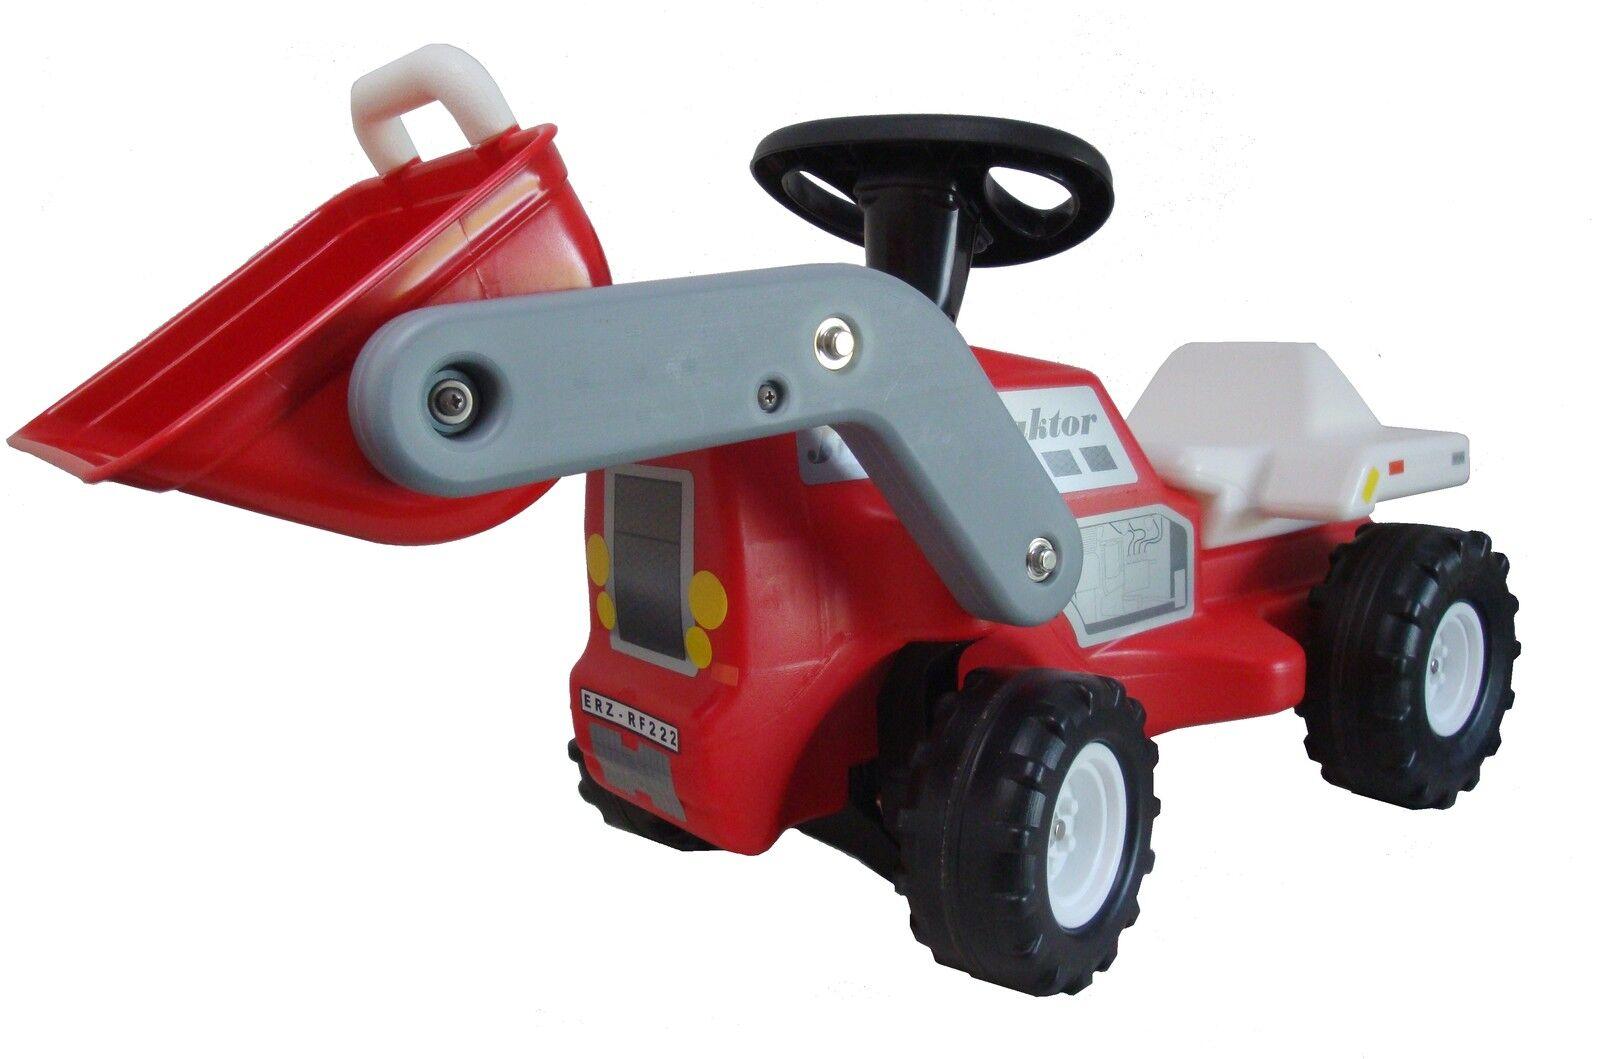 Babyrutscher Traktor rot Kinderfahrzeug Rutschauto Rutscher Plasticart reifra